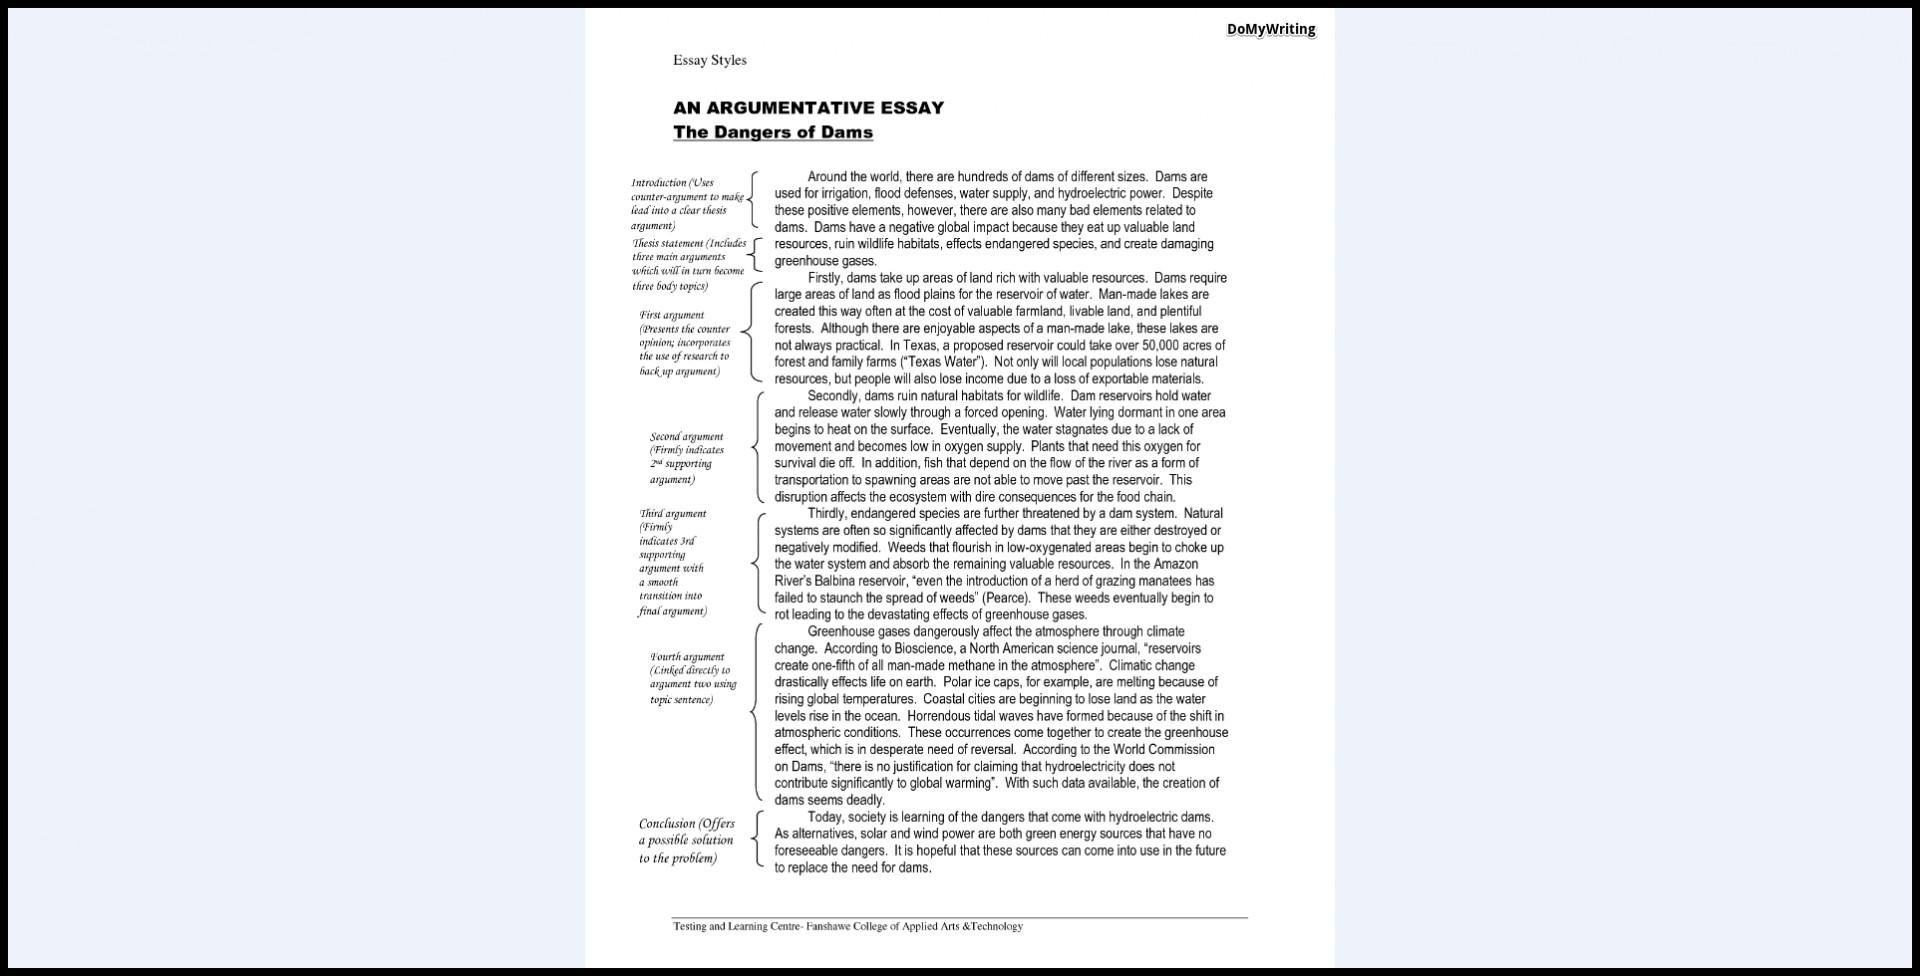 013 Argumentative Research Essay Topicss Singular Topics Interesting For College Students 1920